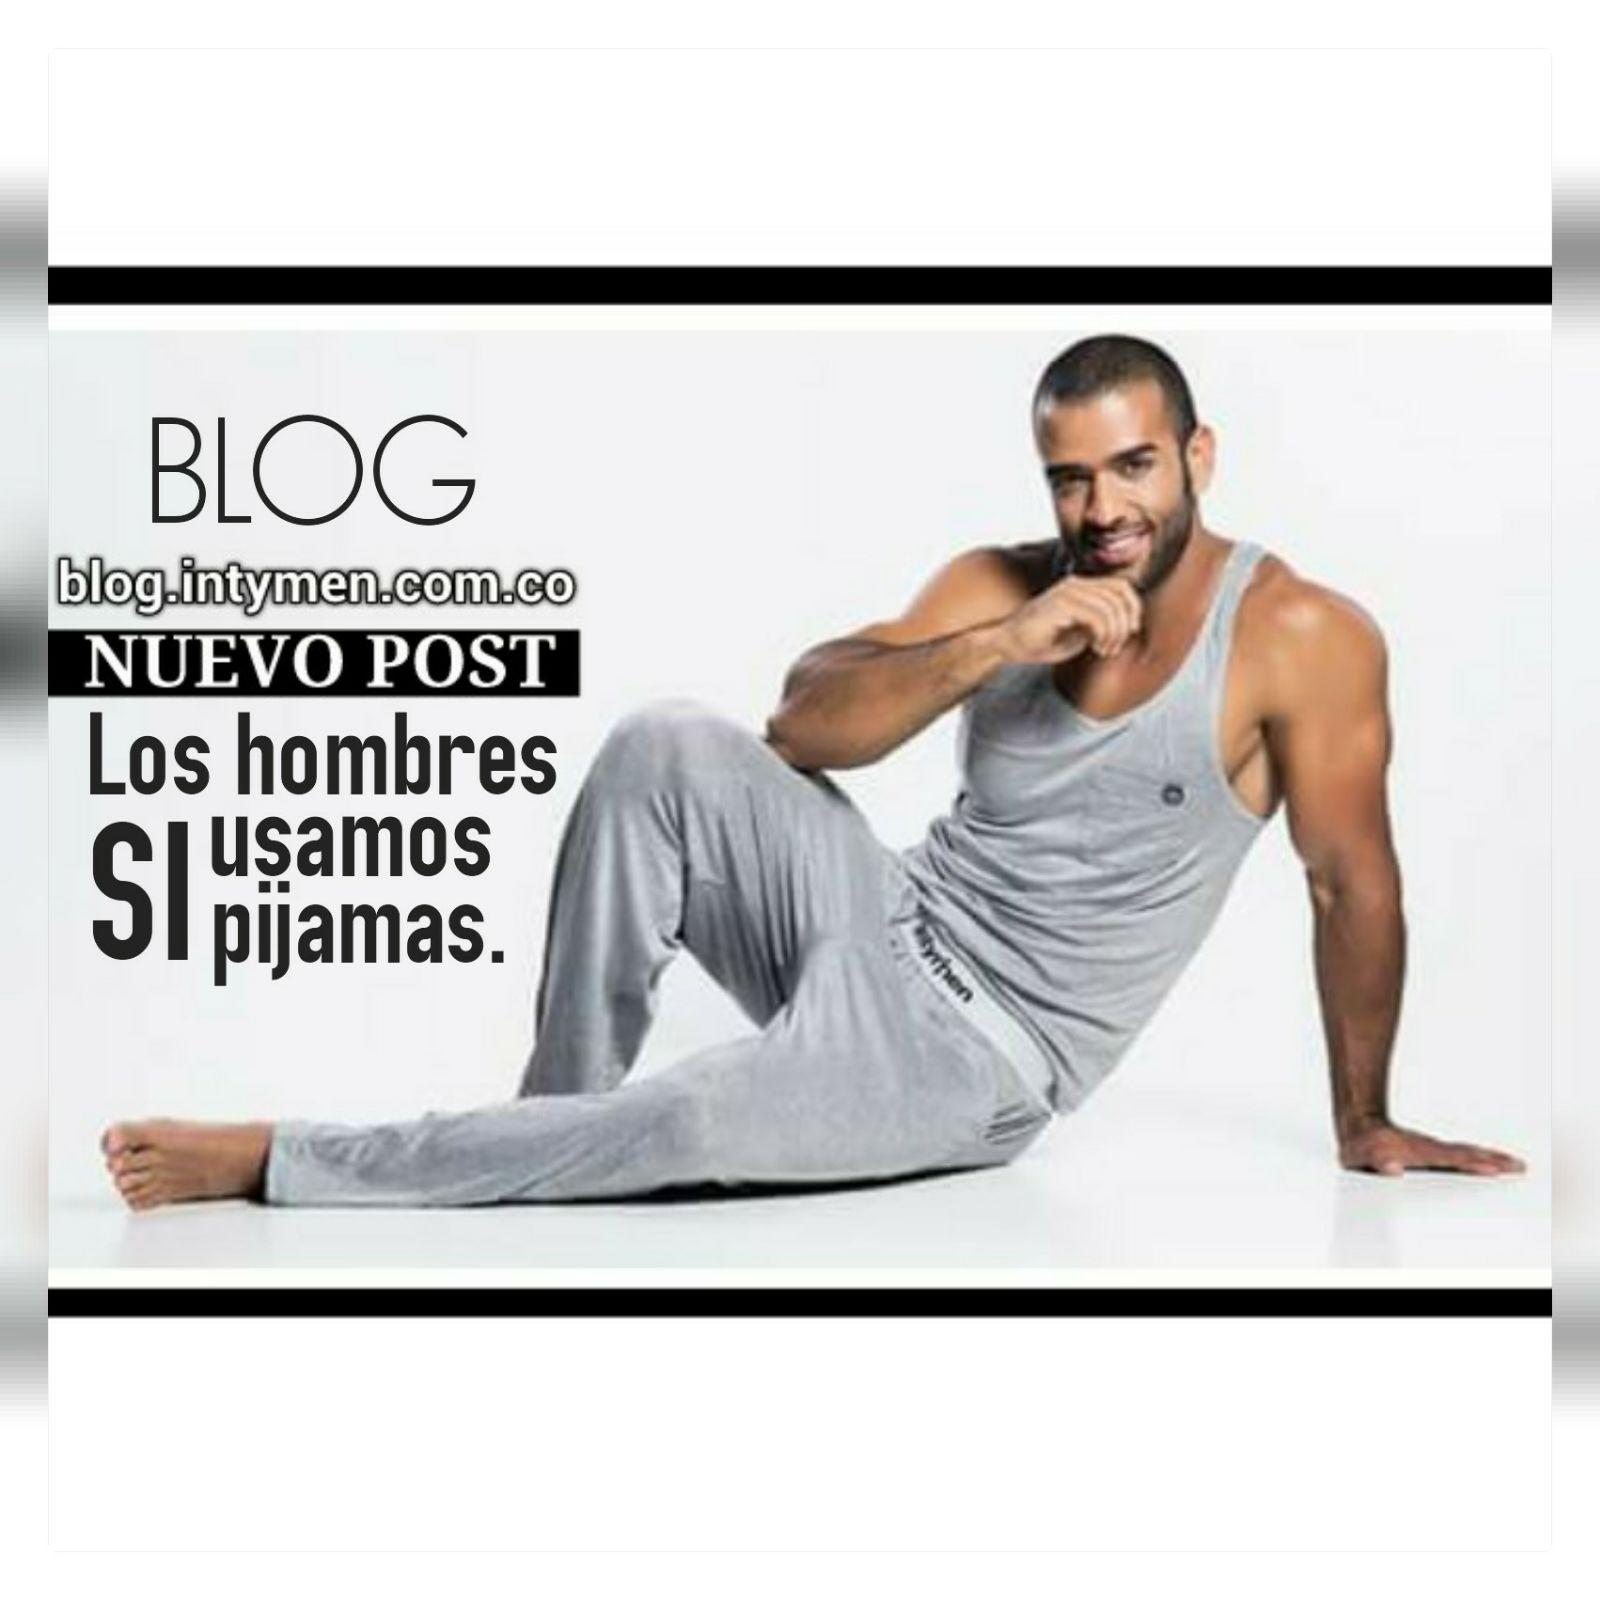 pijamas para hombre, ropa interior masculina, intymen ropa para hombre